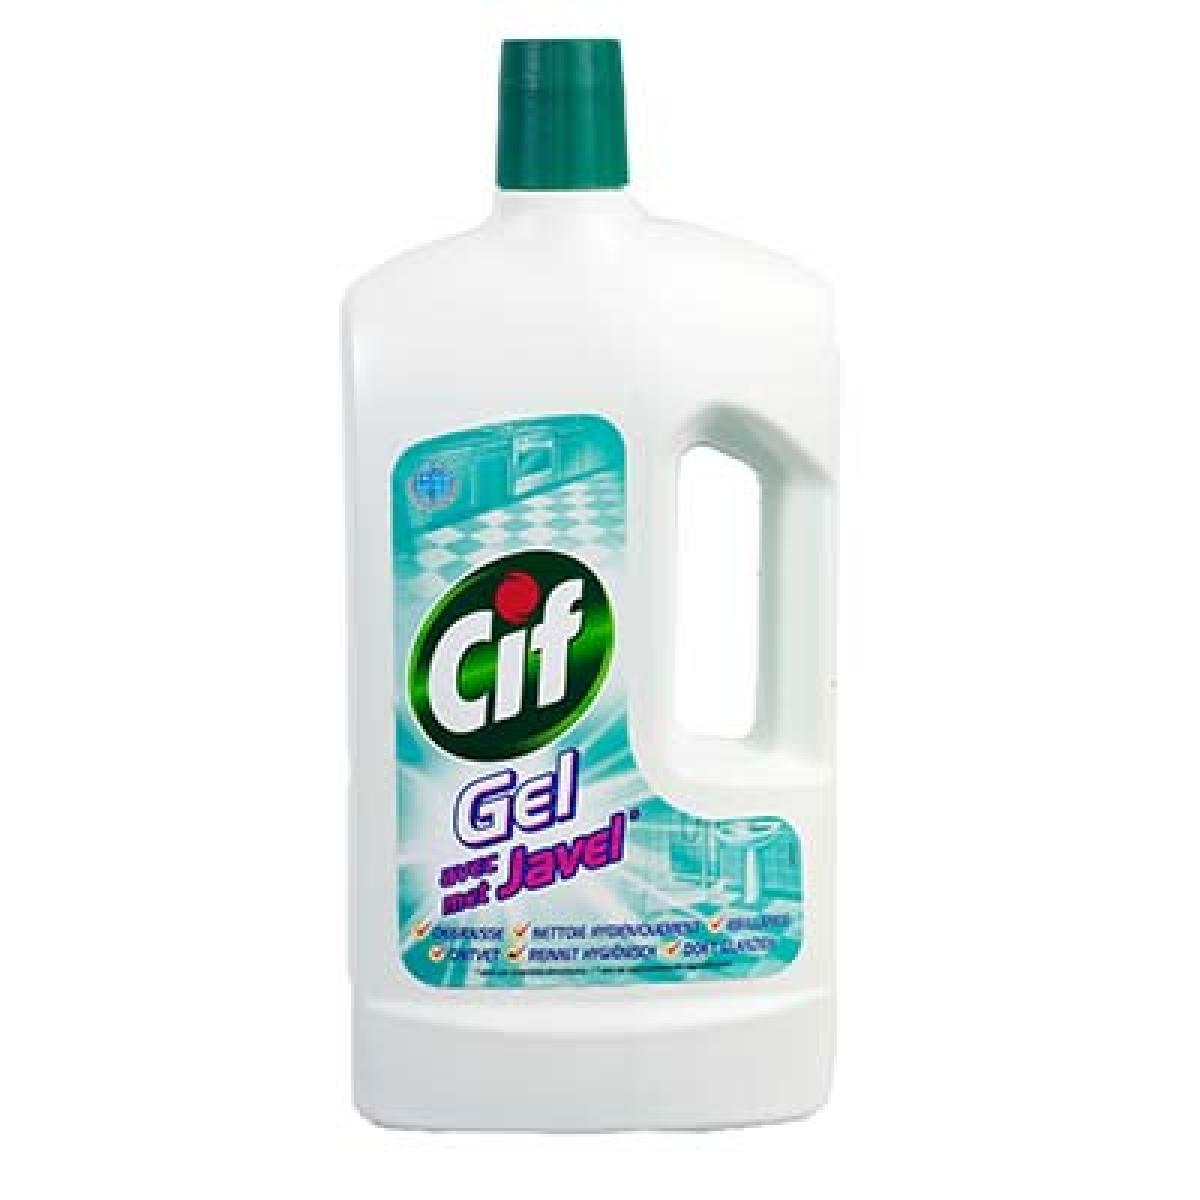 Nettoyant gel avec javel, Cif (1 L)